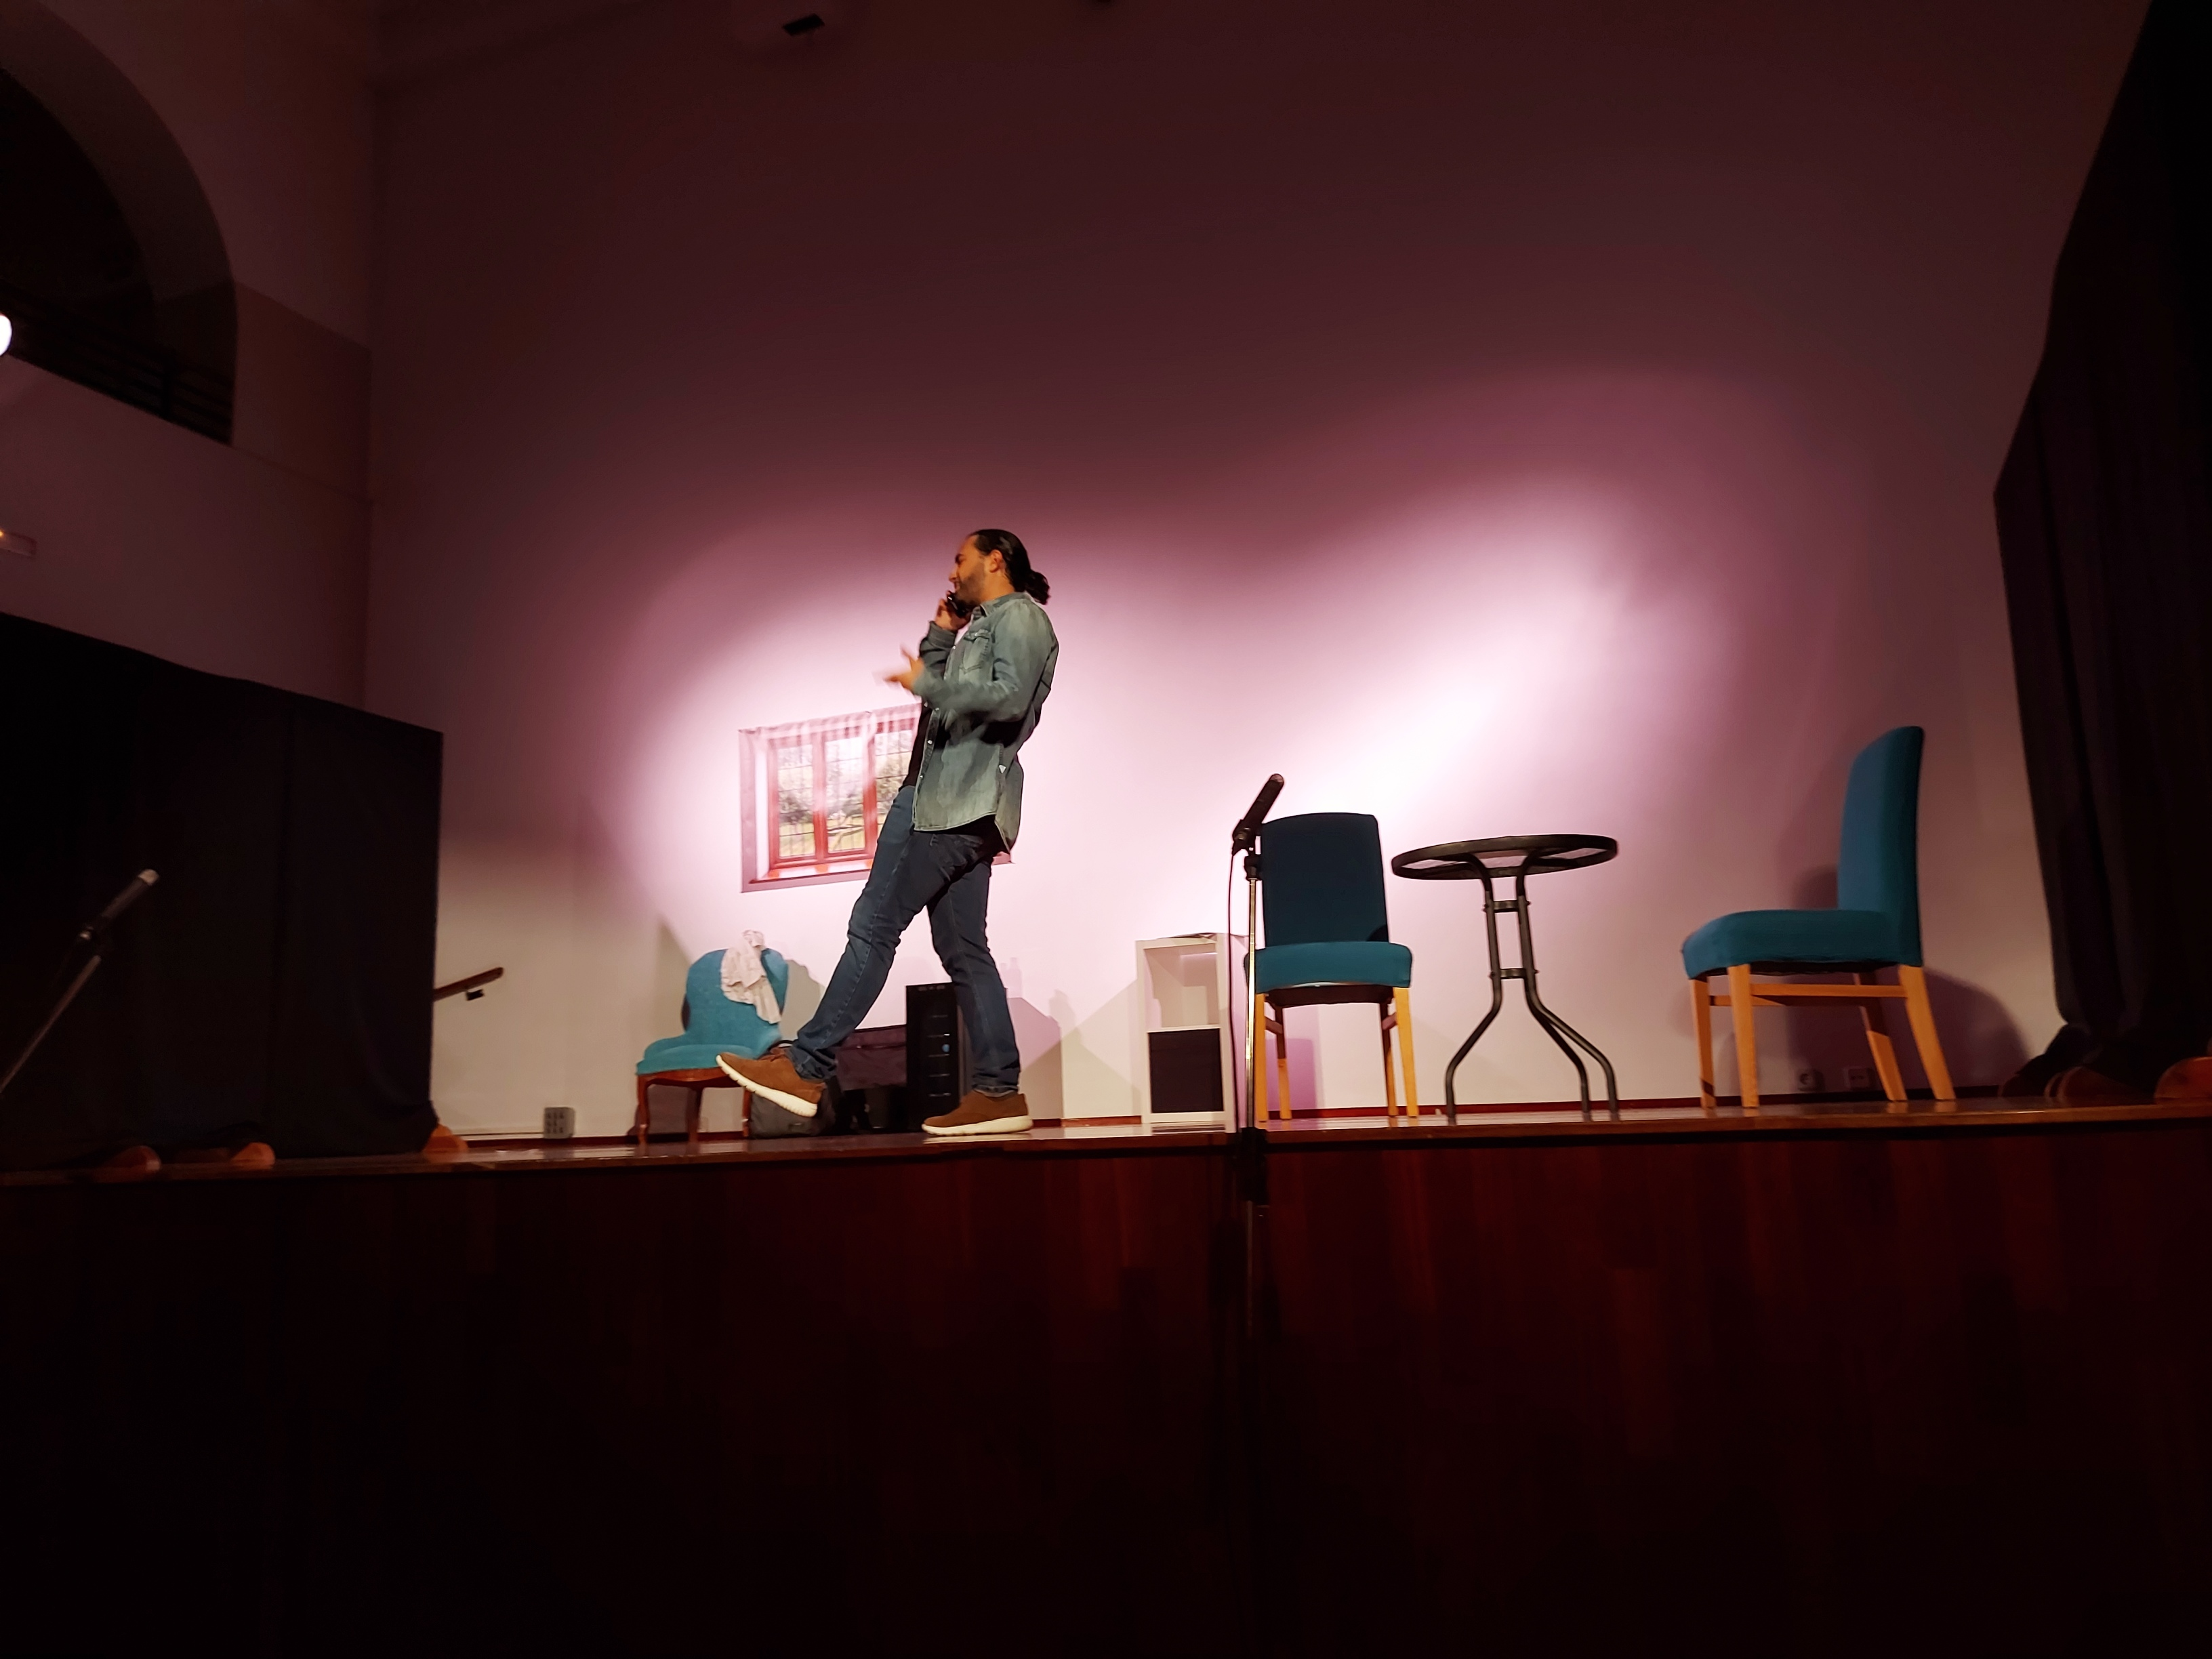 20210422190625_happened_61_teatro-laberinto-de-crisol-teatro-5.jpg